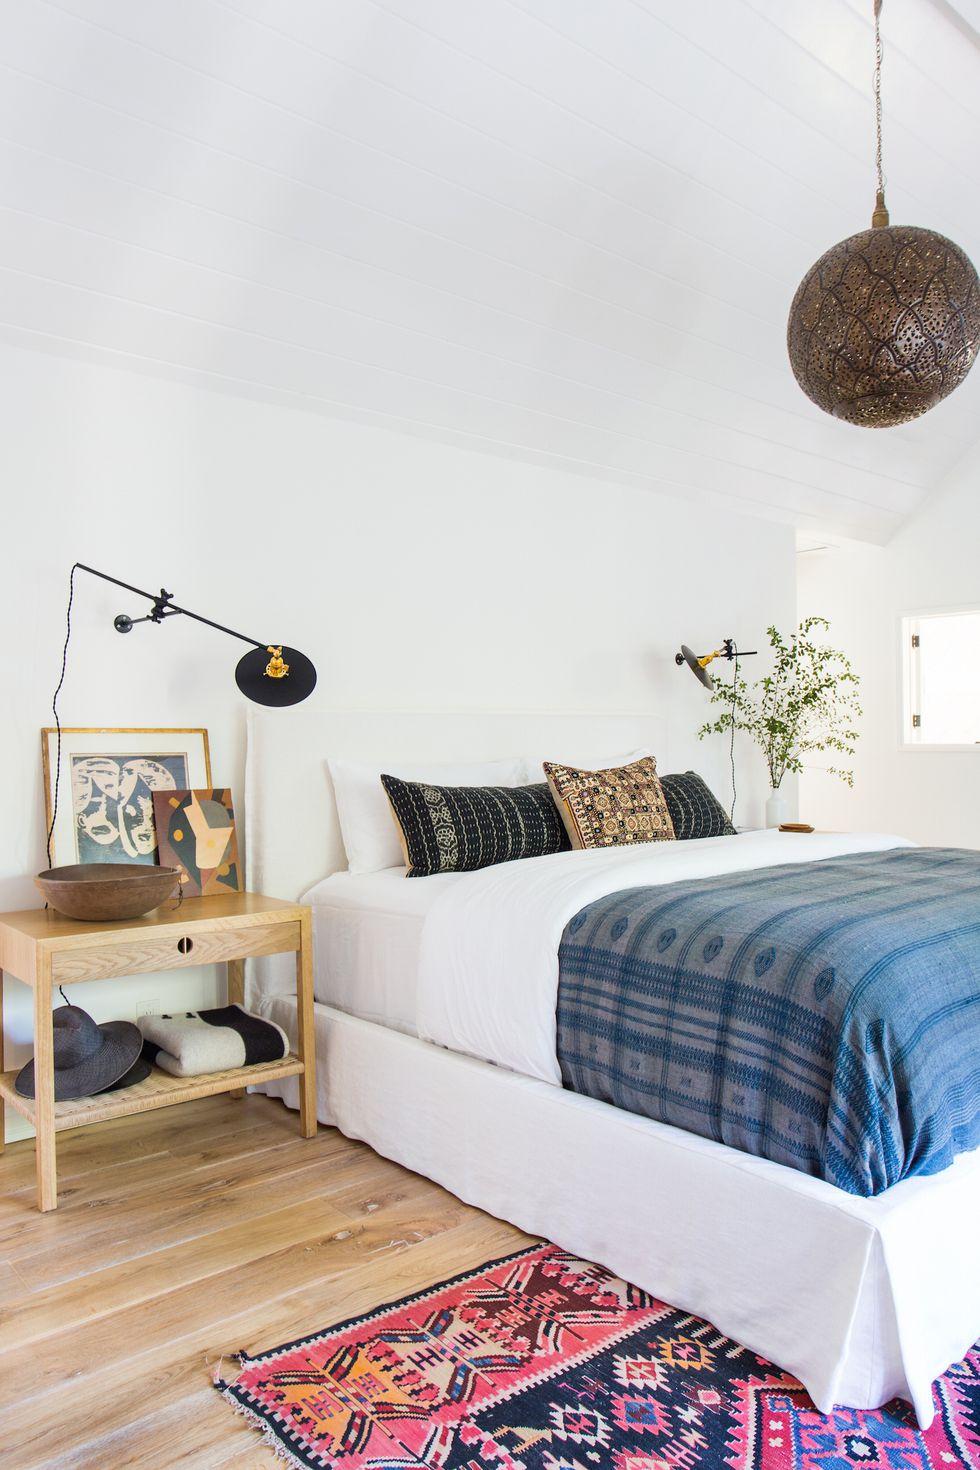 5 Feng ShuiBedroom Ideas 5 Feng Shui Bedroom Ideas To A Better Sleeping Time! 5 Feng Shui Bedroom Ideas To A Better Sleeping Time 3